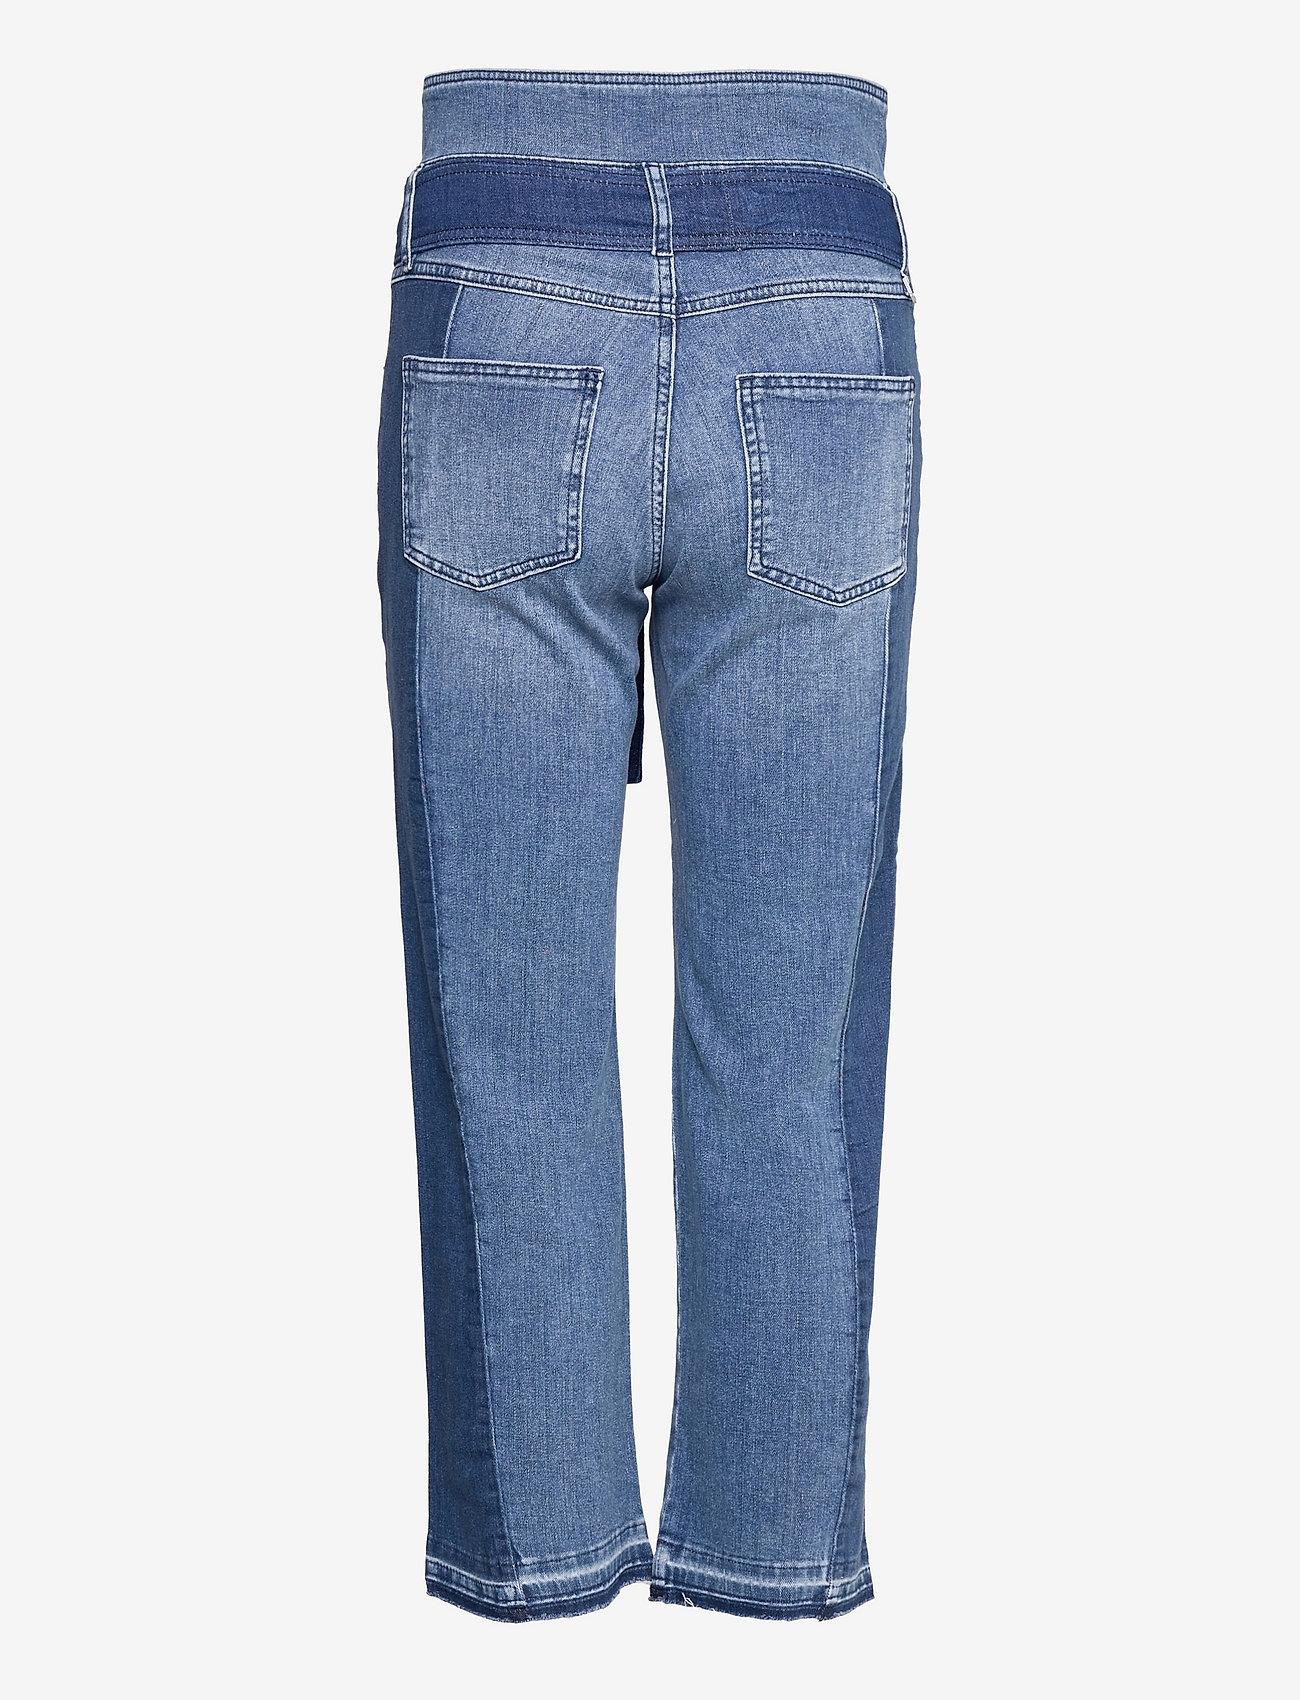 Max&Co. - FESTIVO - straight jeans - midnight blue - 1